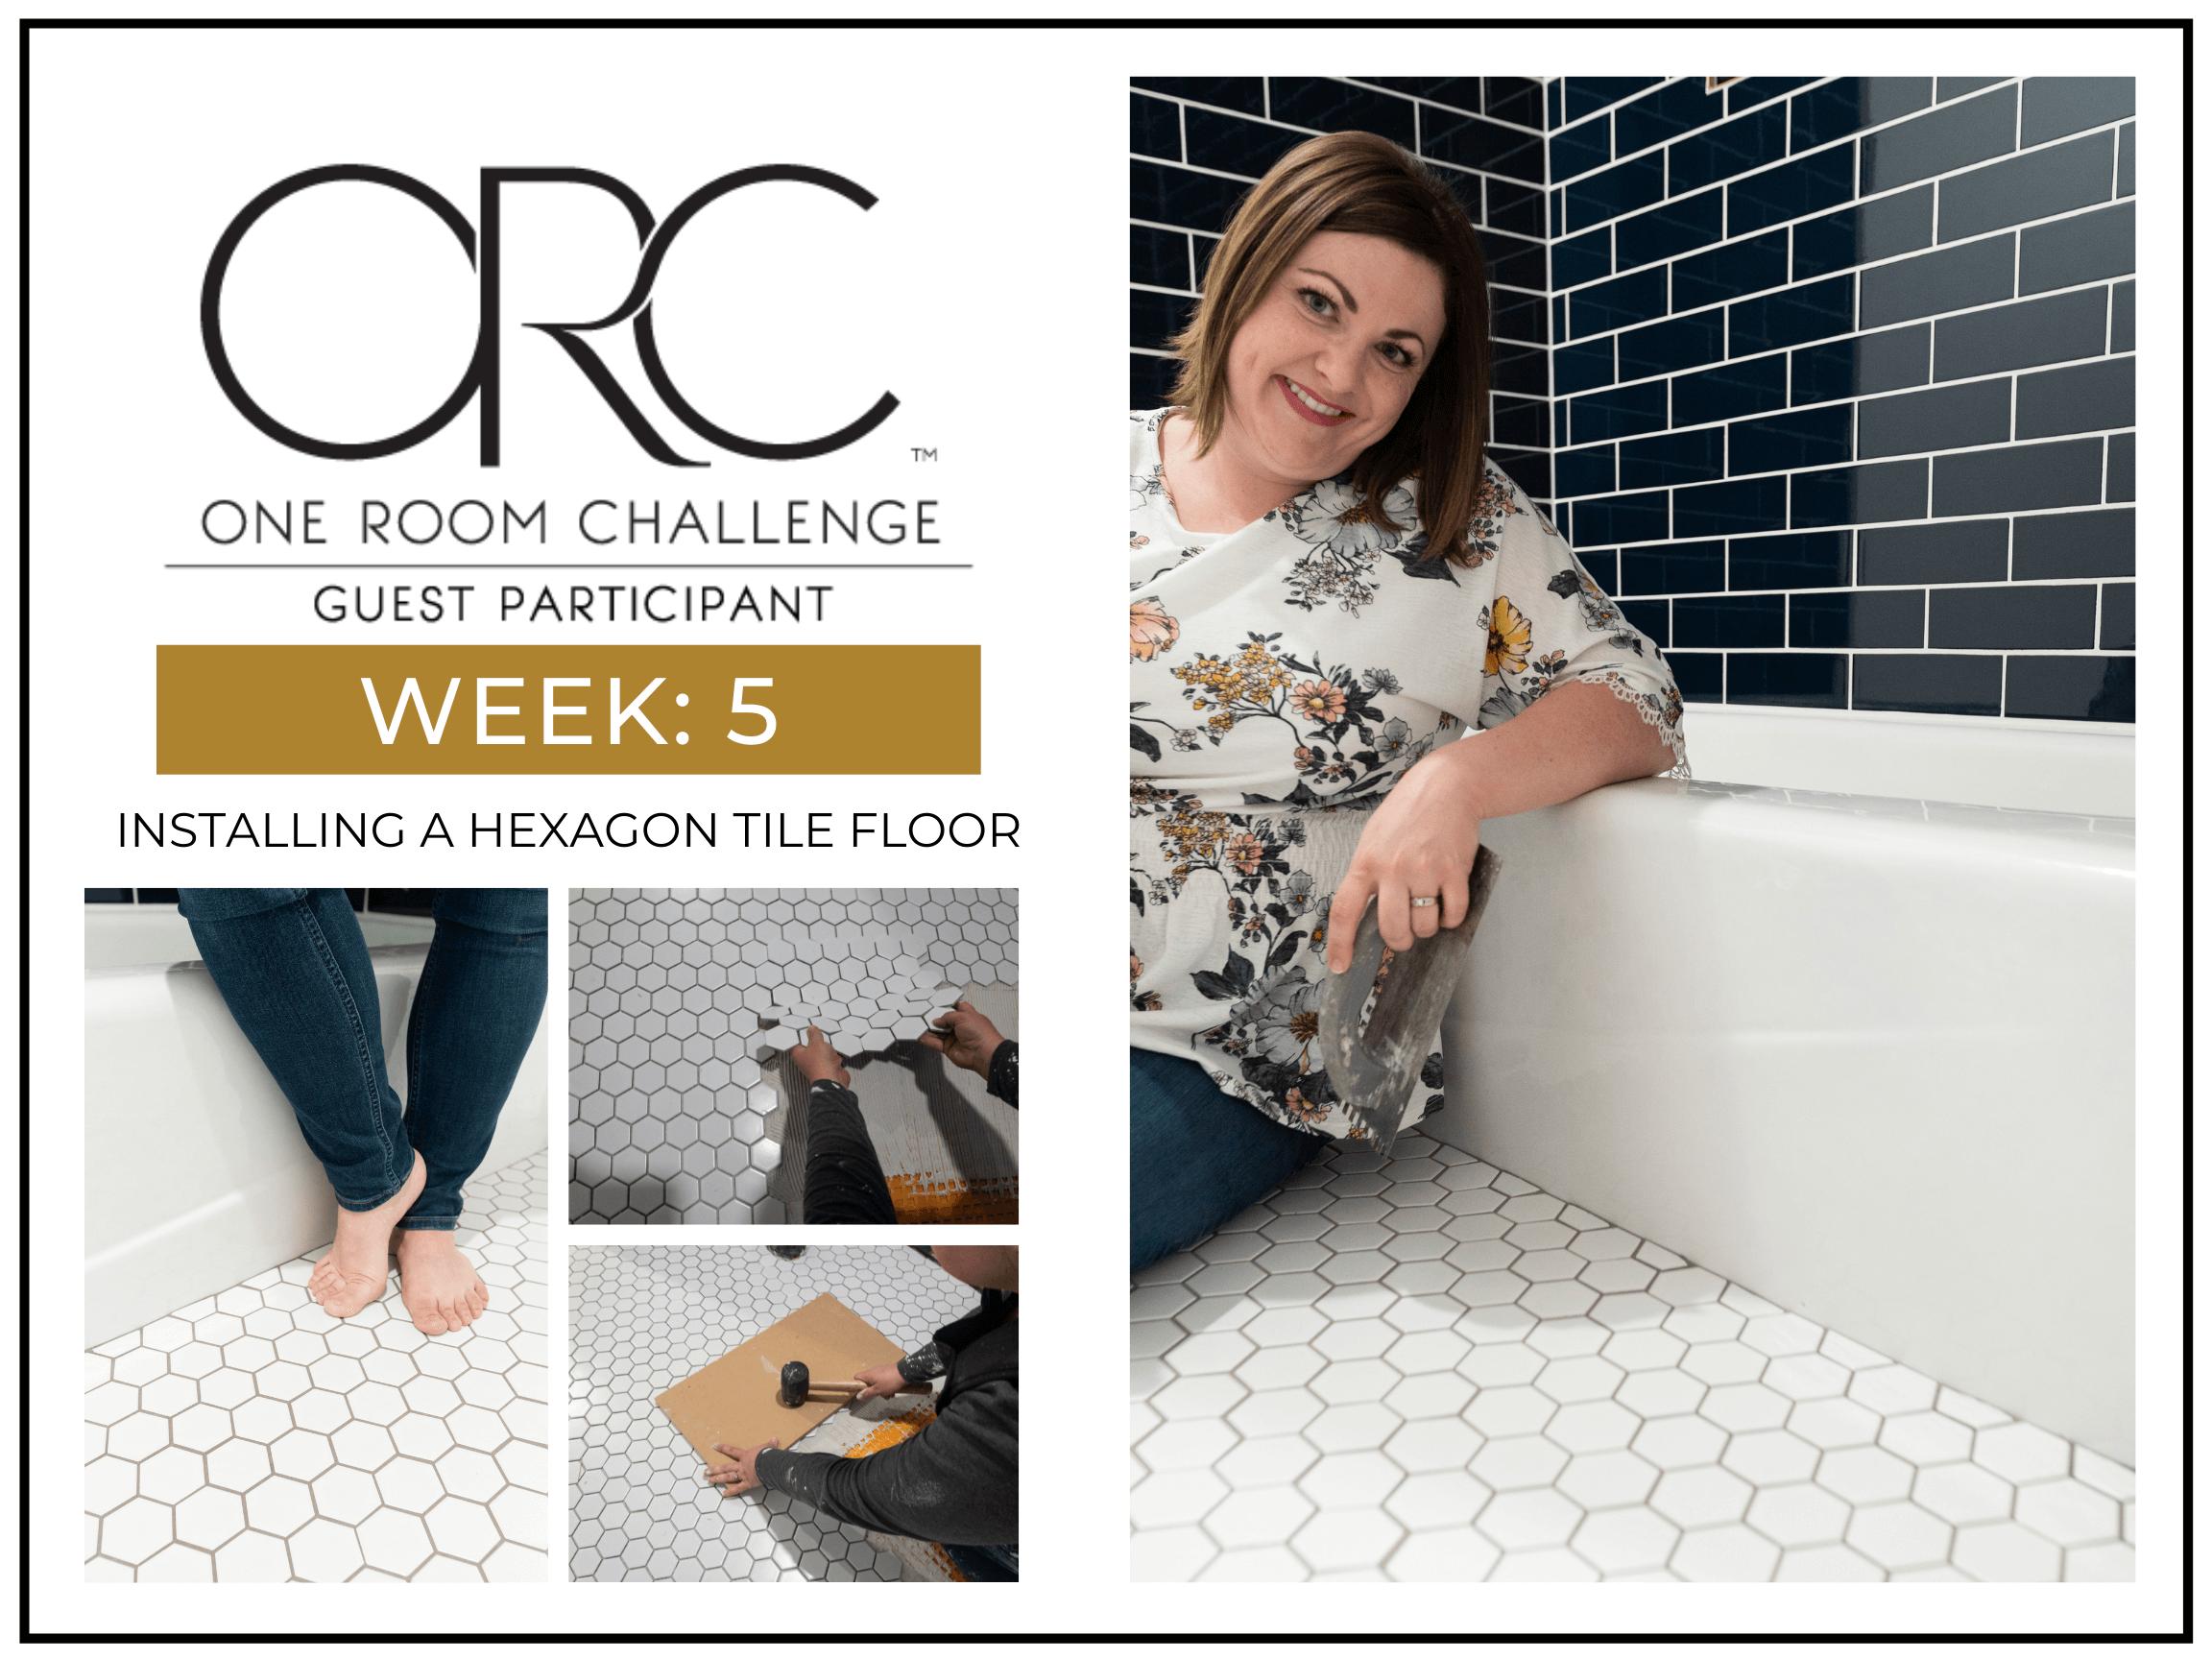 How To Install a Hexagon Bathroom Floor Tile a Beginner's Guide